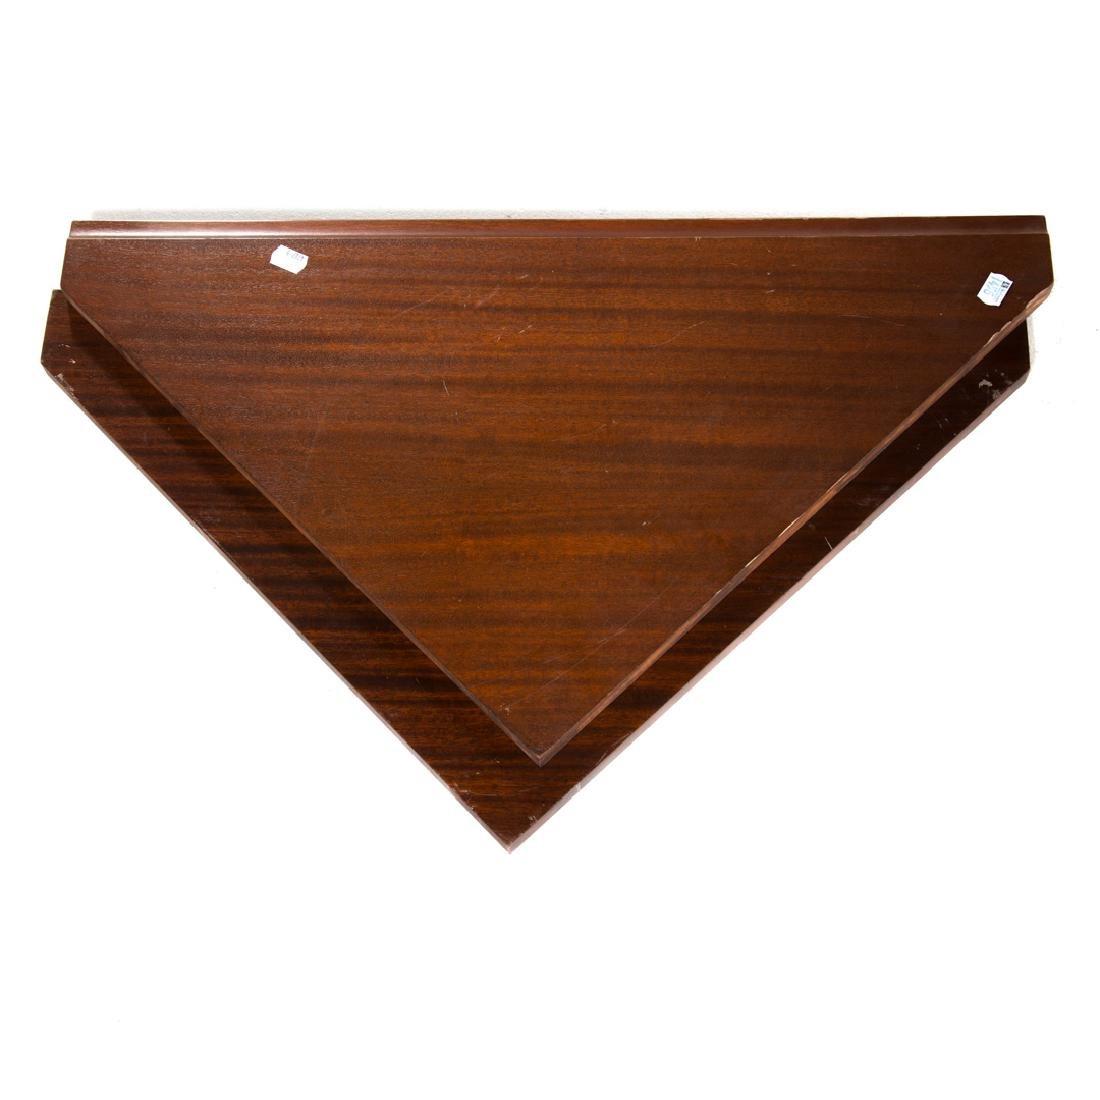 Federal style inlaid mahogany corner cabinet - 5